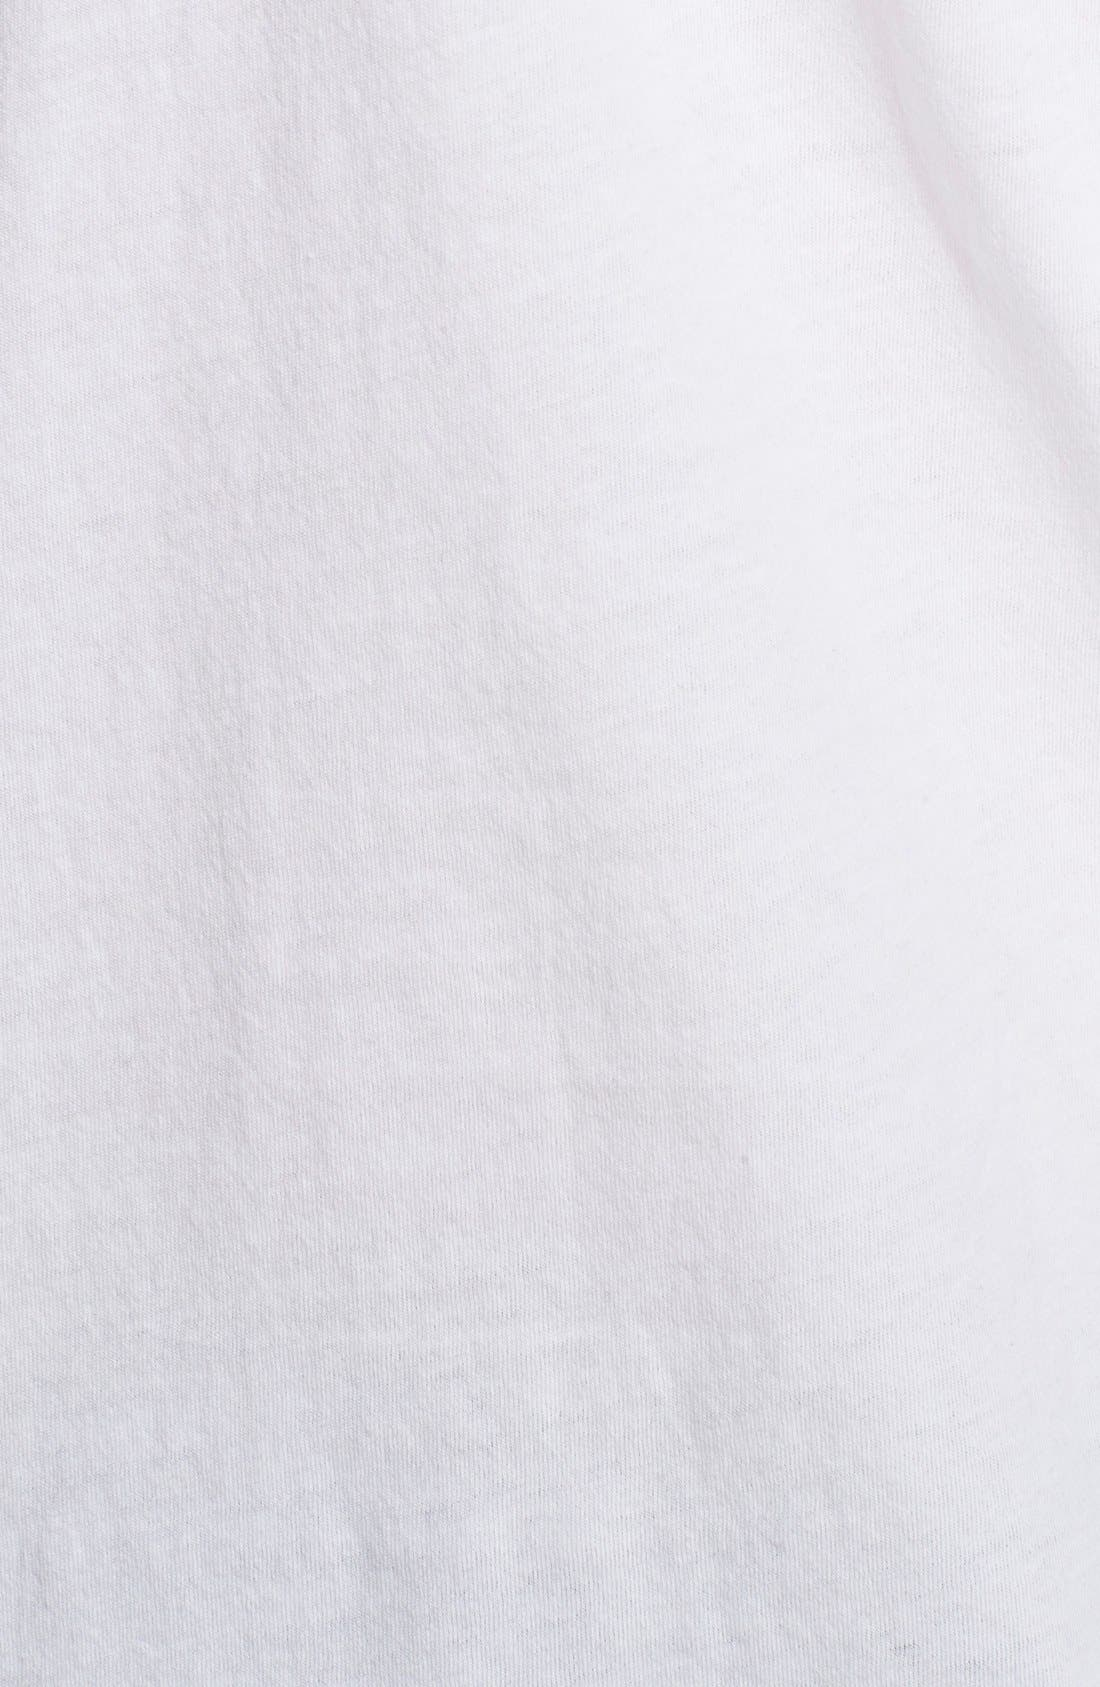 Cotton Jersey T-Shirt,                             Alternate thumbnail 8, color,                             WHITE